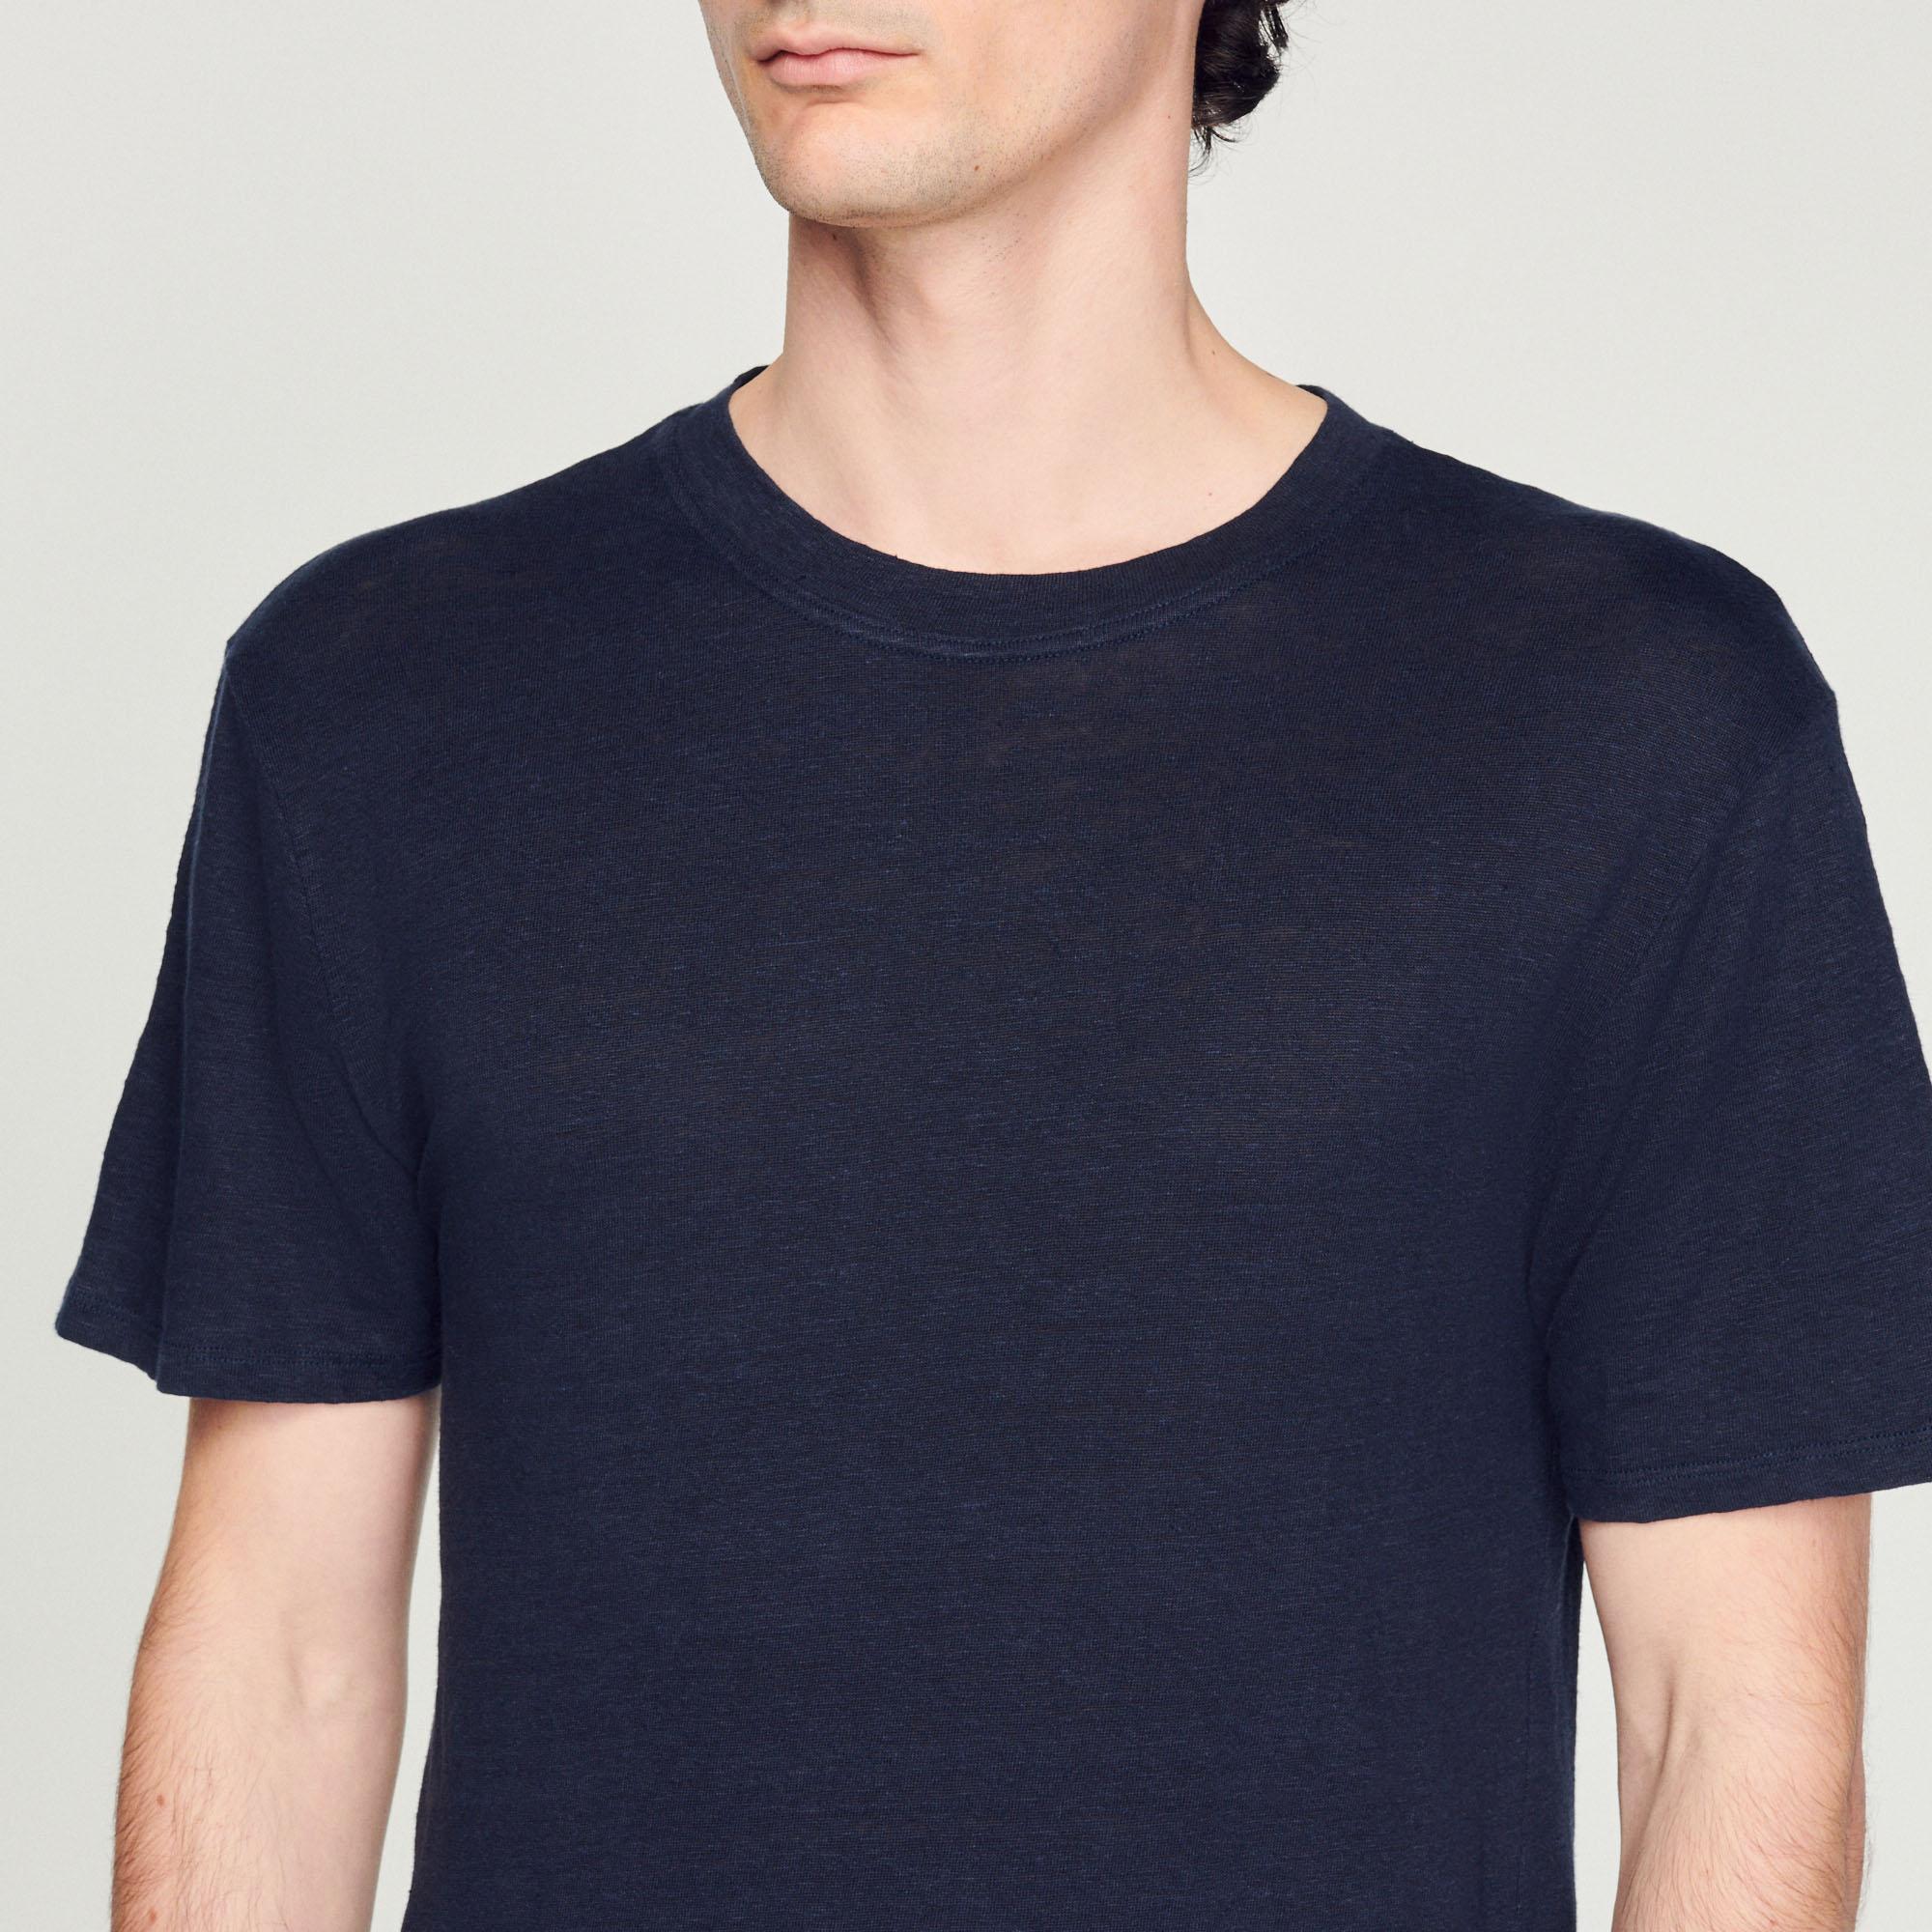 t shirt en lin shpts00222 marine t shirts polos. Black Bedroom Furniture Sets. Home Design Ideas